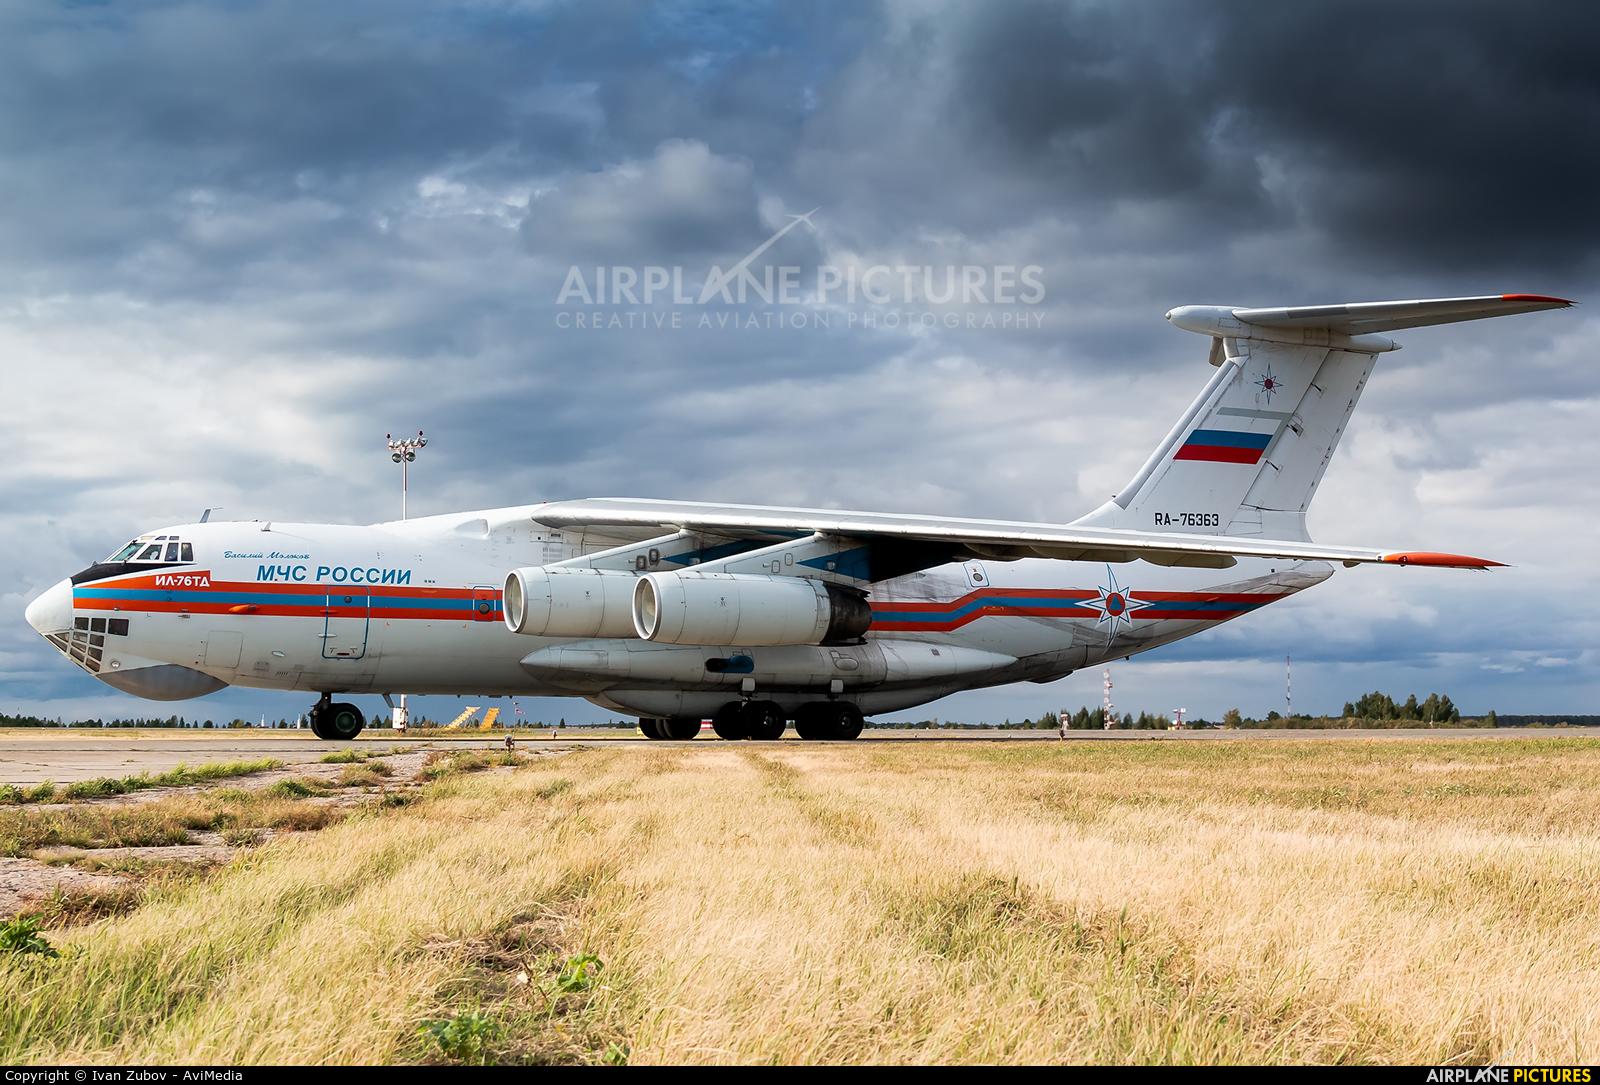 Russia - МЧС России EMERCOM RA-76363 aircraft at Chelyabinsk